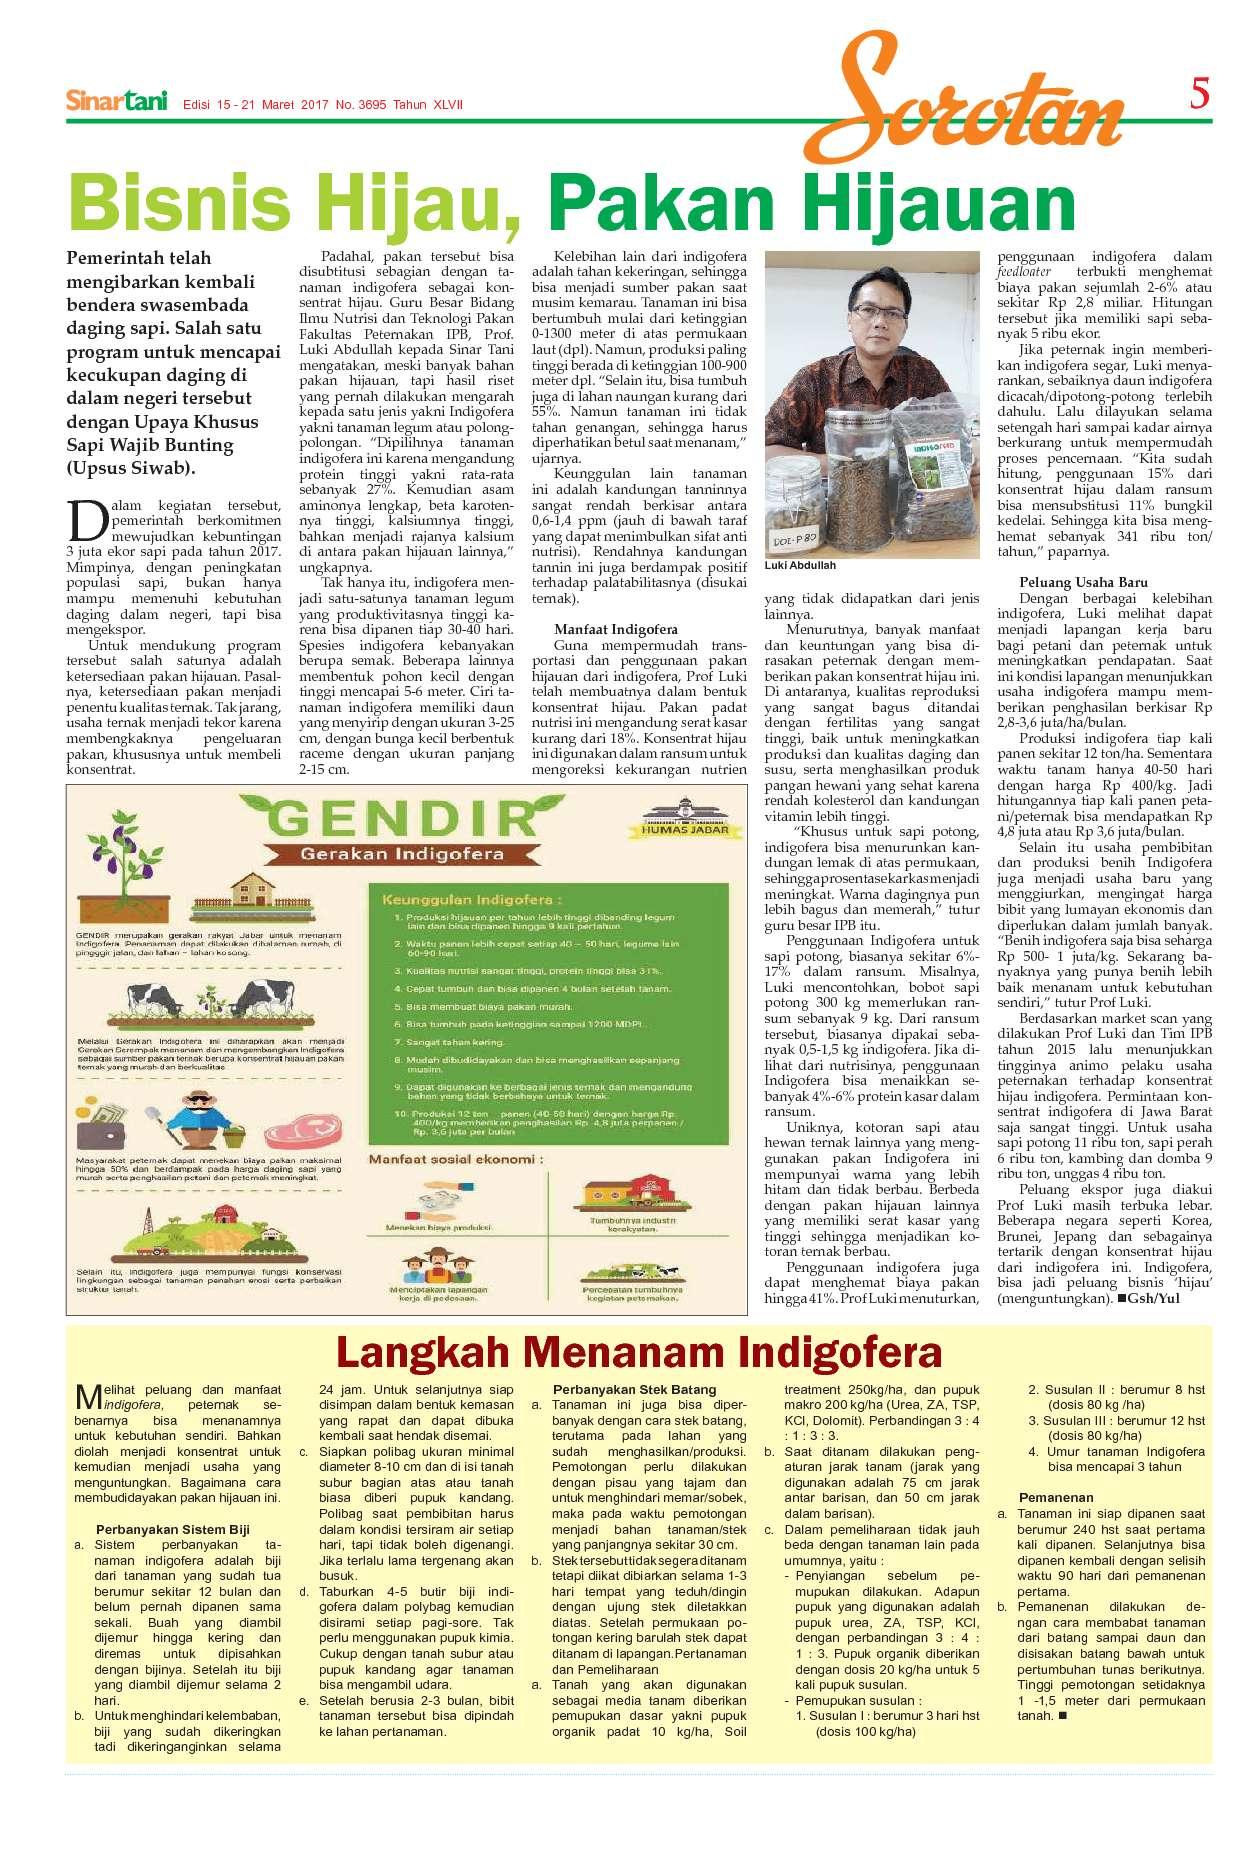 Sinar Tani Magazine Ed 3695 March 2017 Gramedia Digital